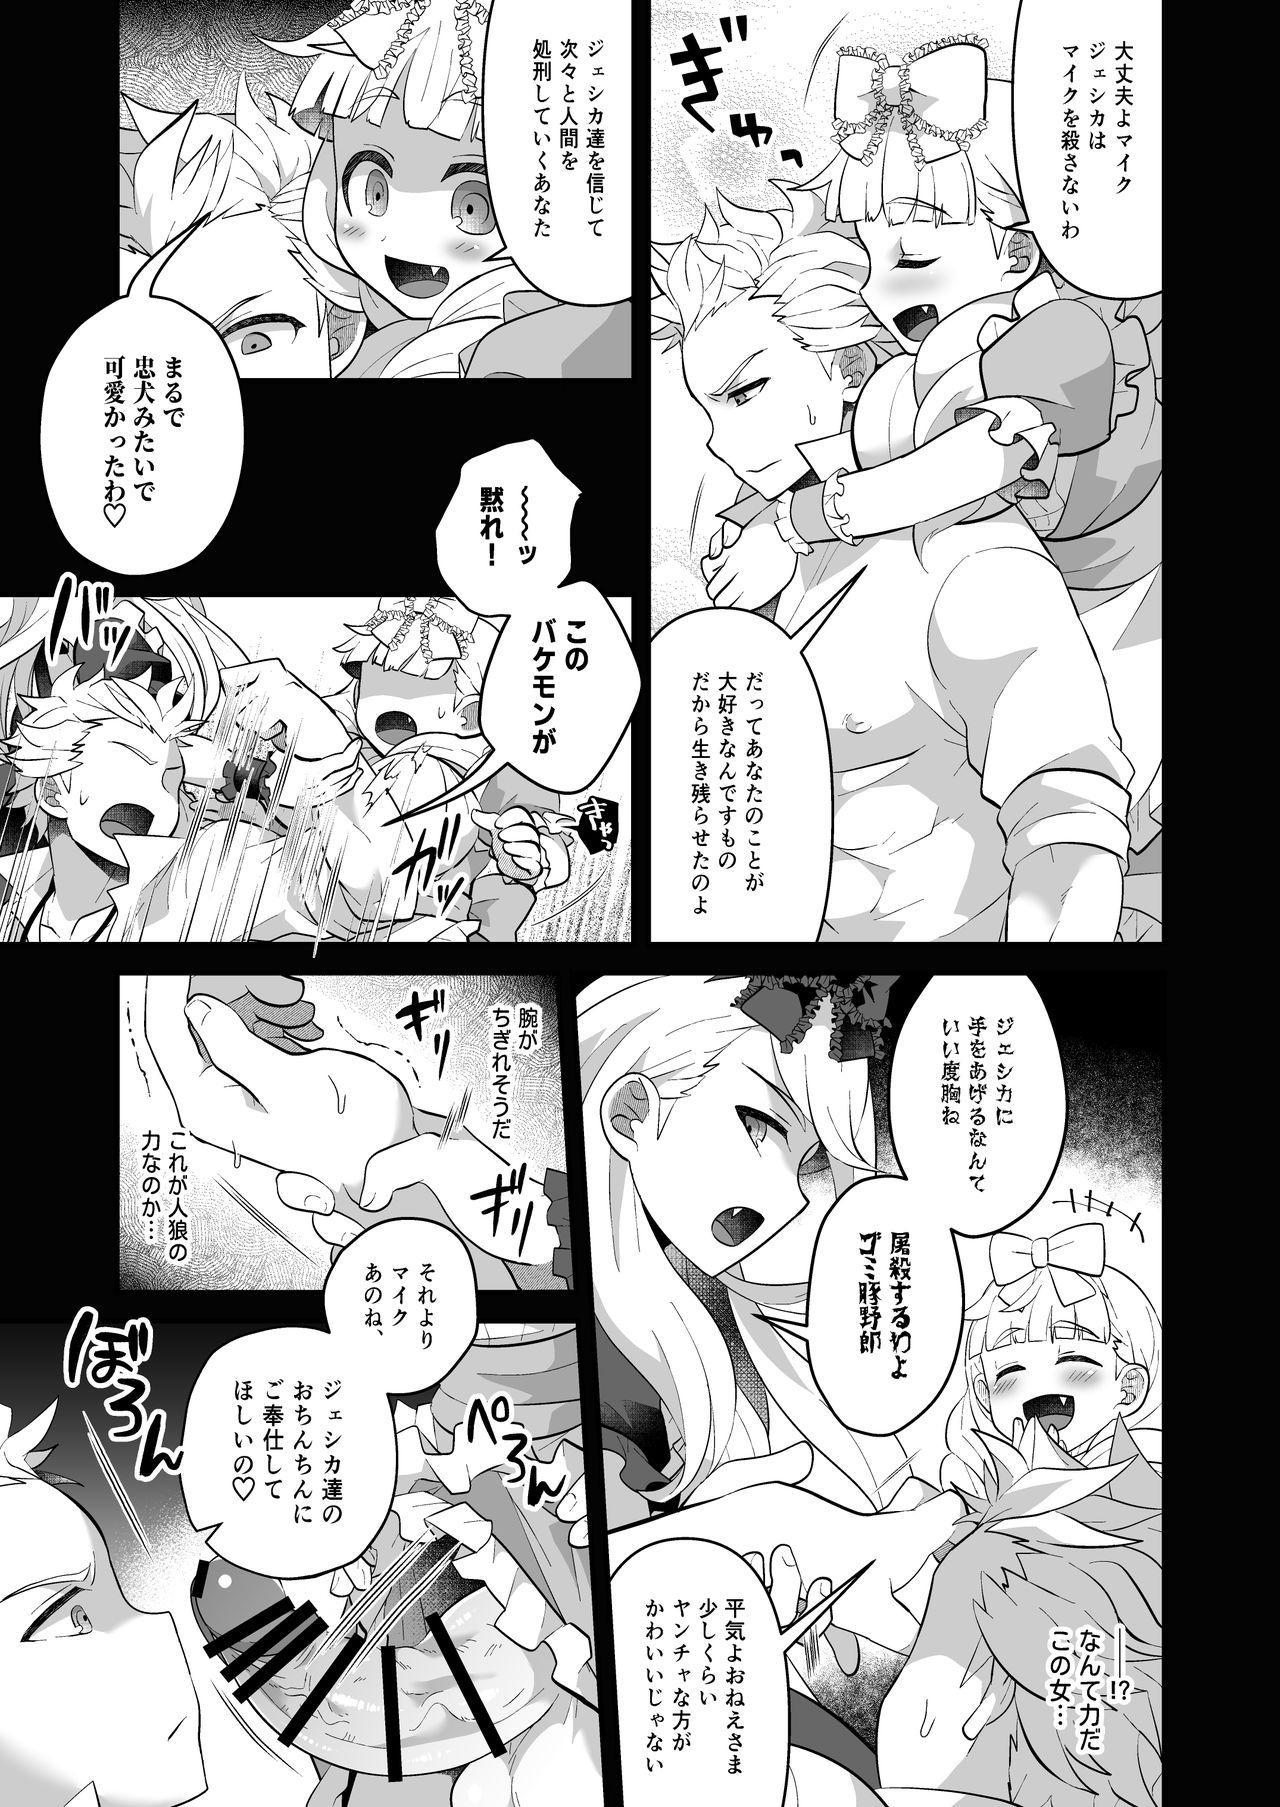 Onee-sama, Kore ga Hoshiino 4